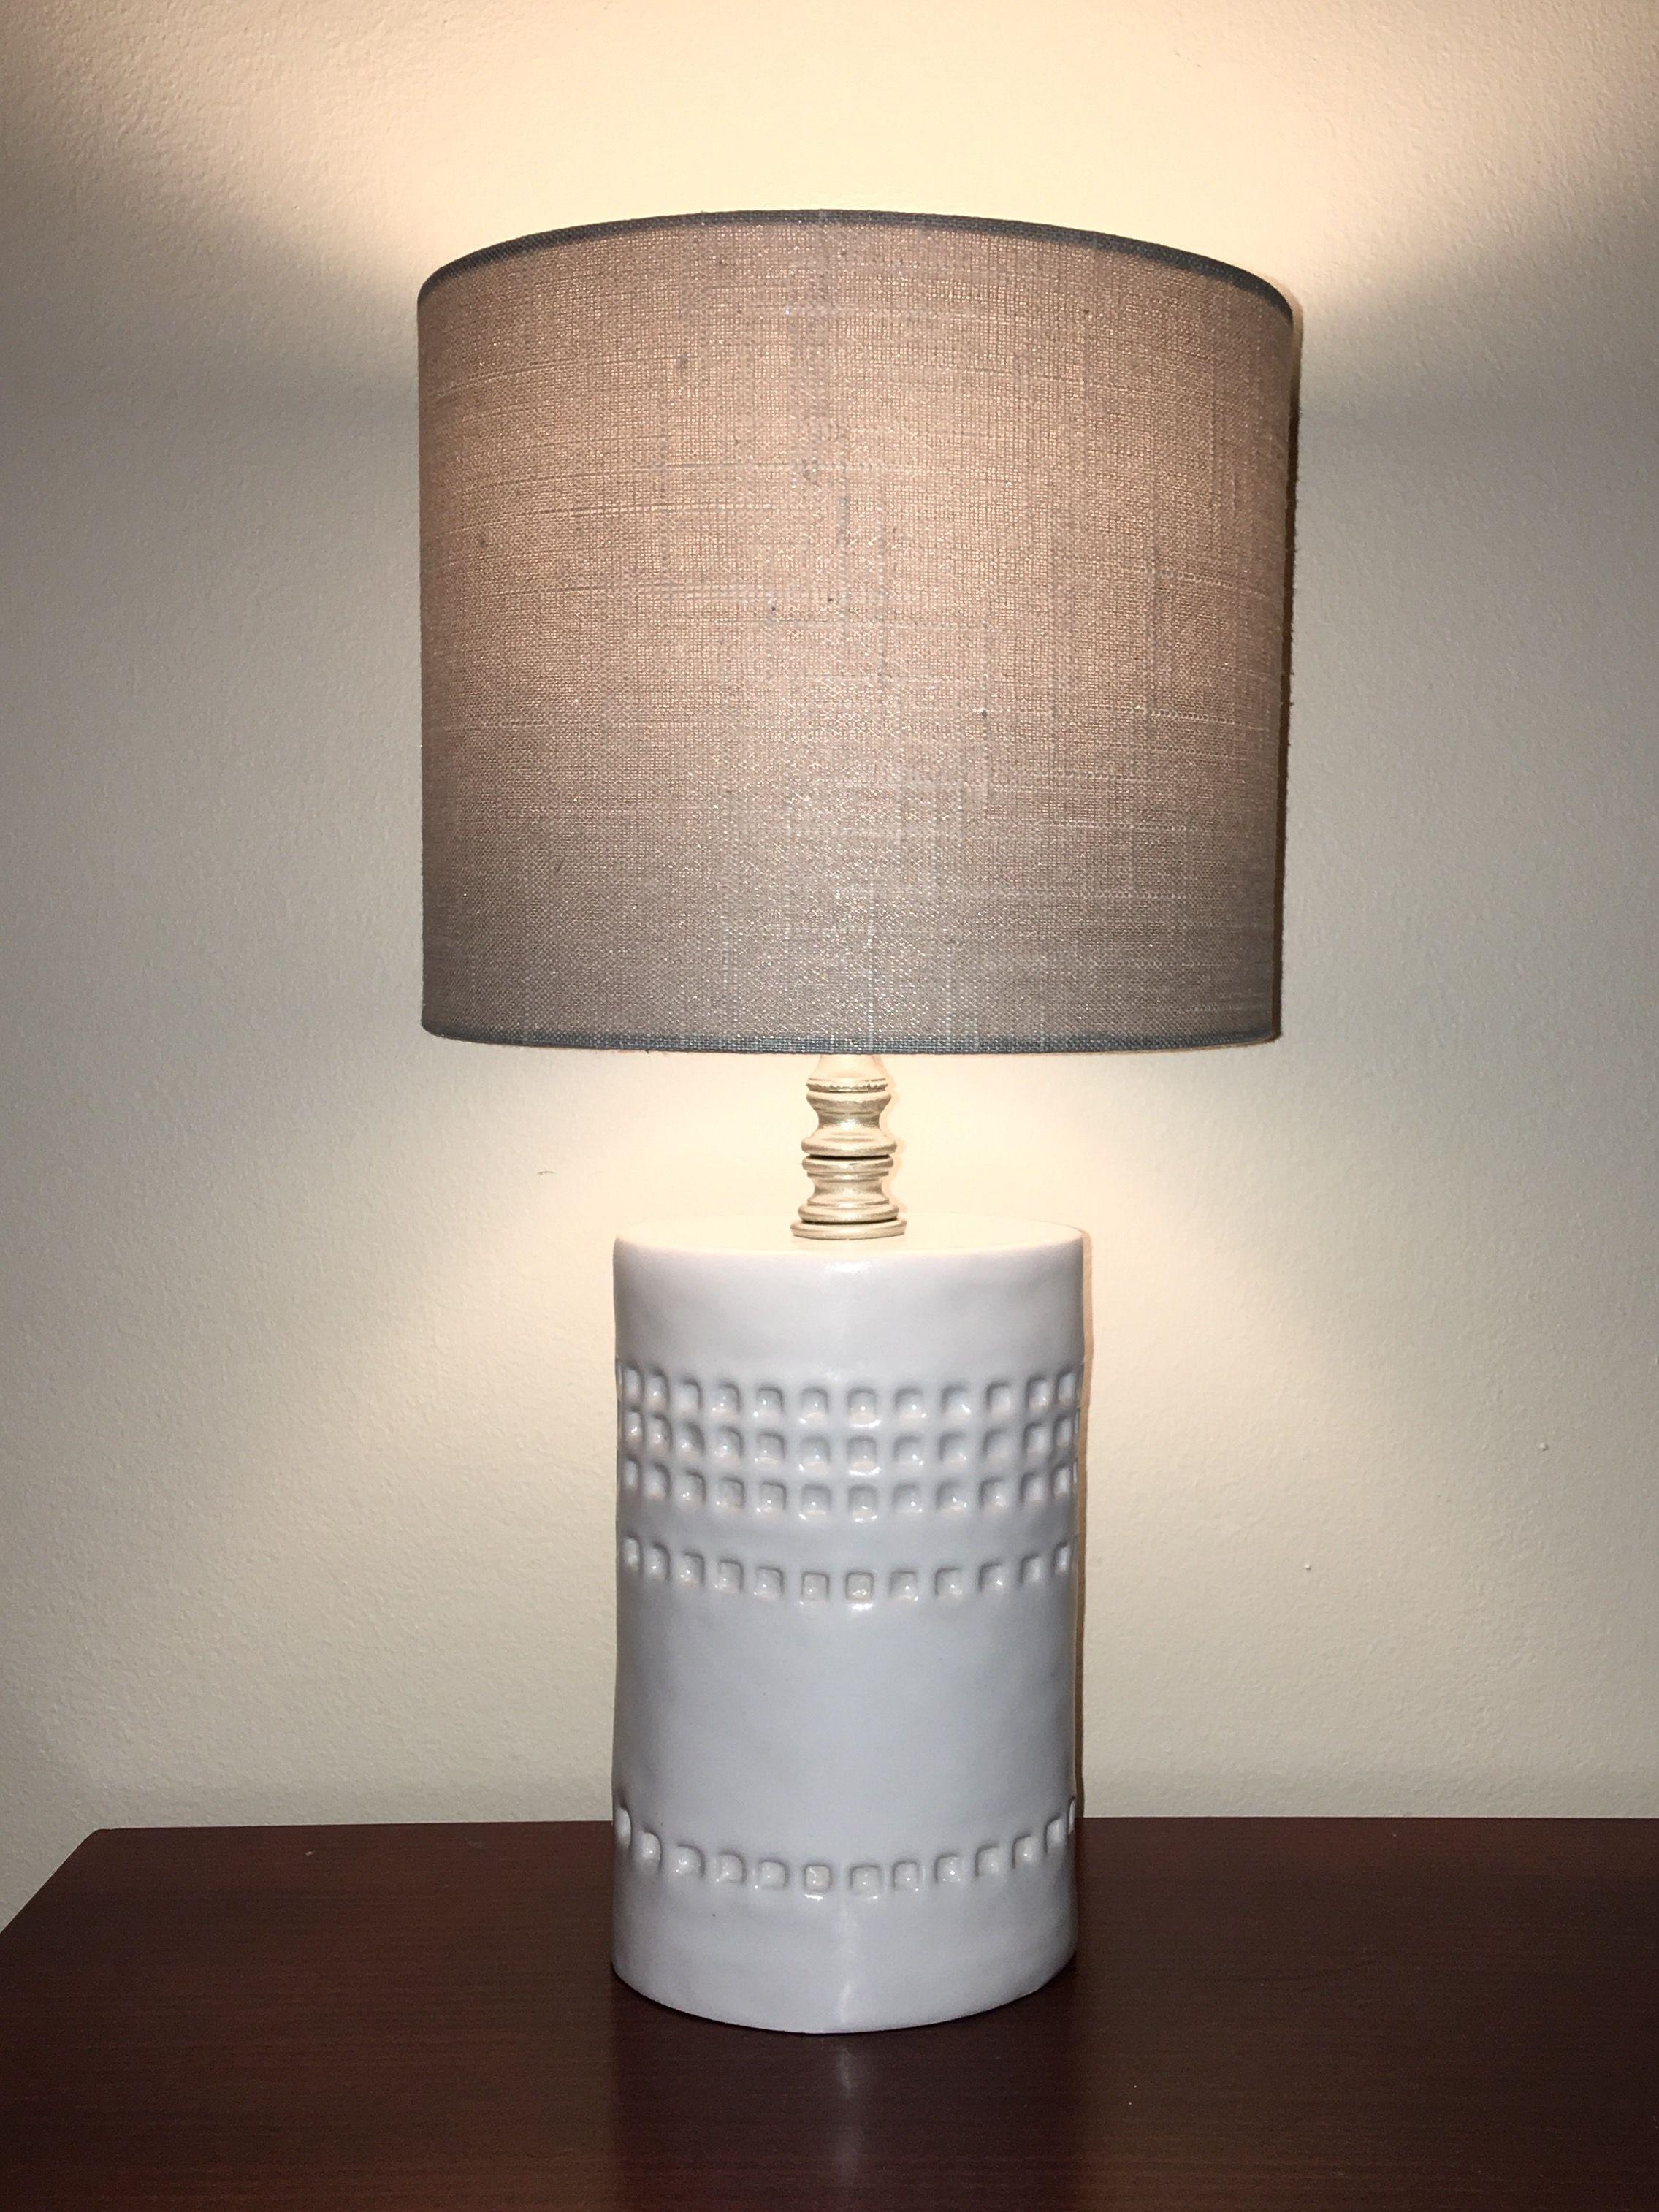 Handmade Ceramic Table Lamp Base Slab Built And Glazed In Shiny White Ceramic Table Lamps Pottery Lamp Lamp